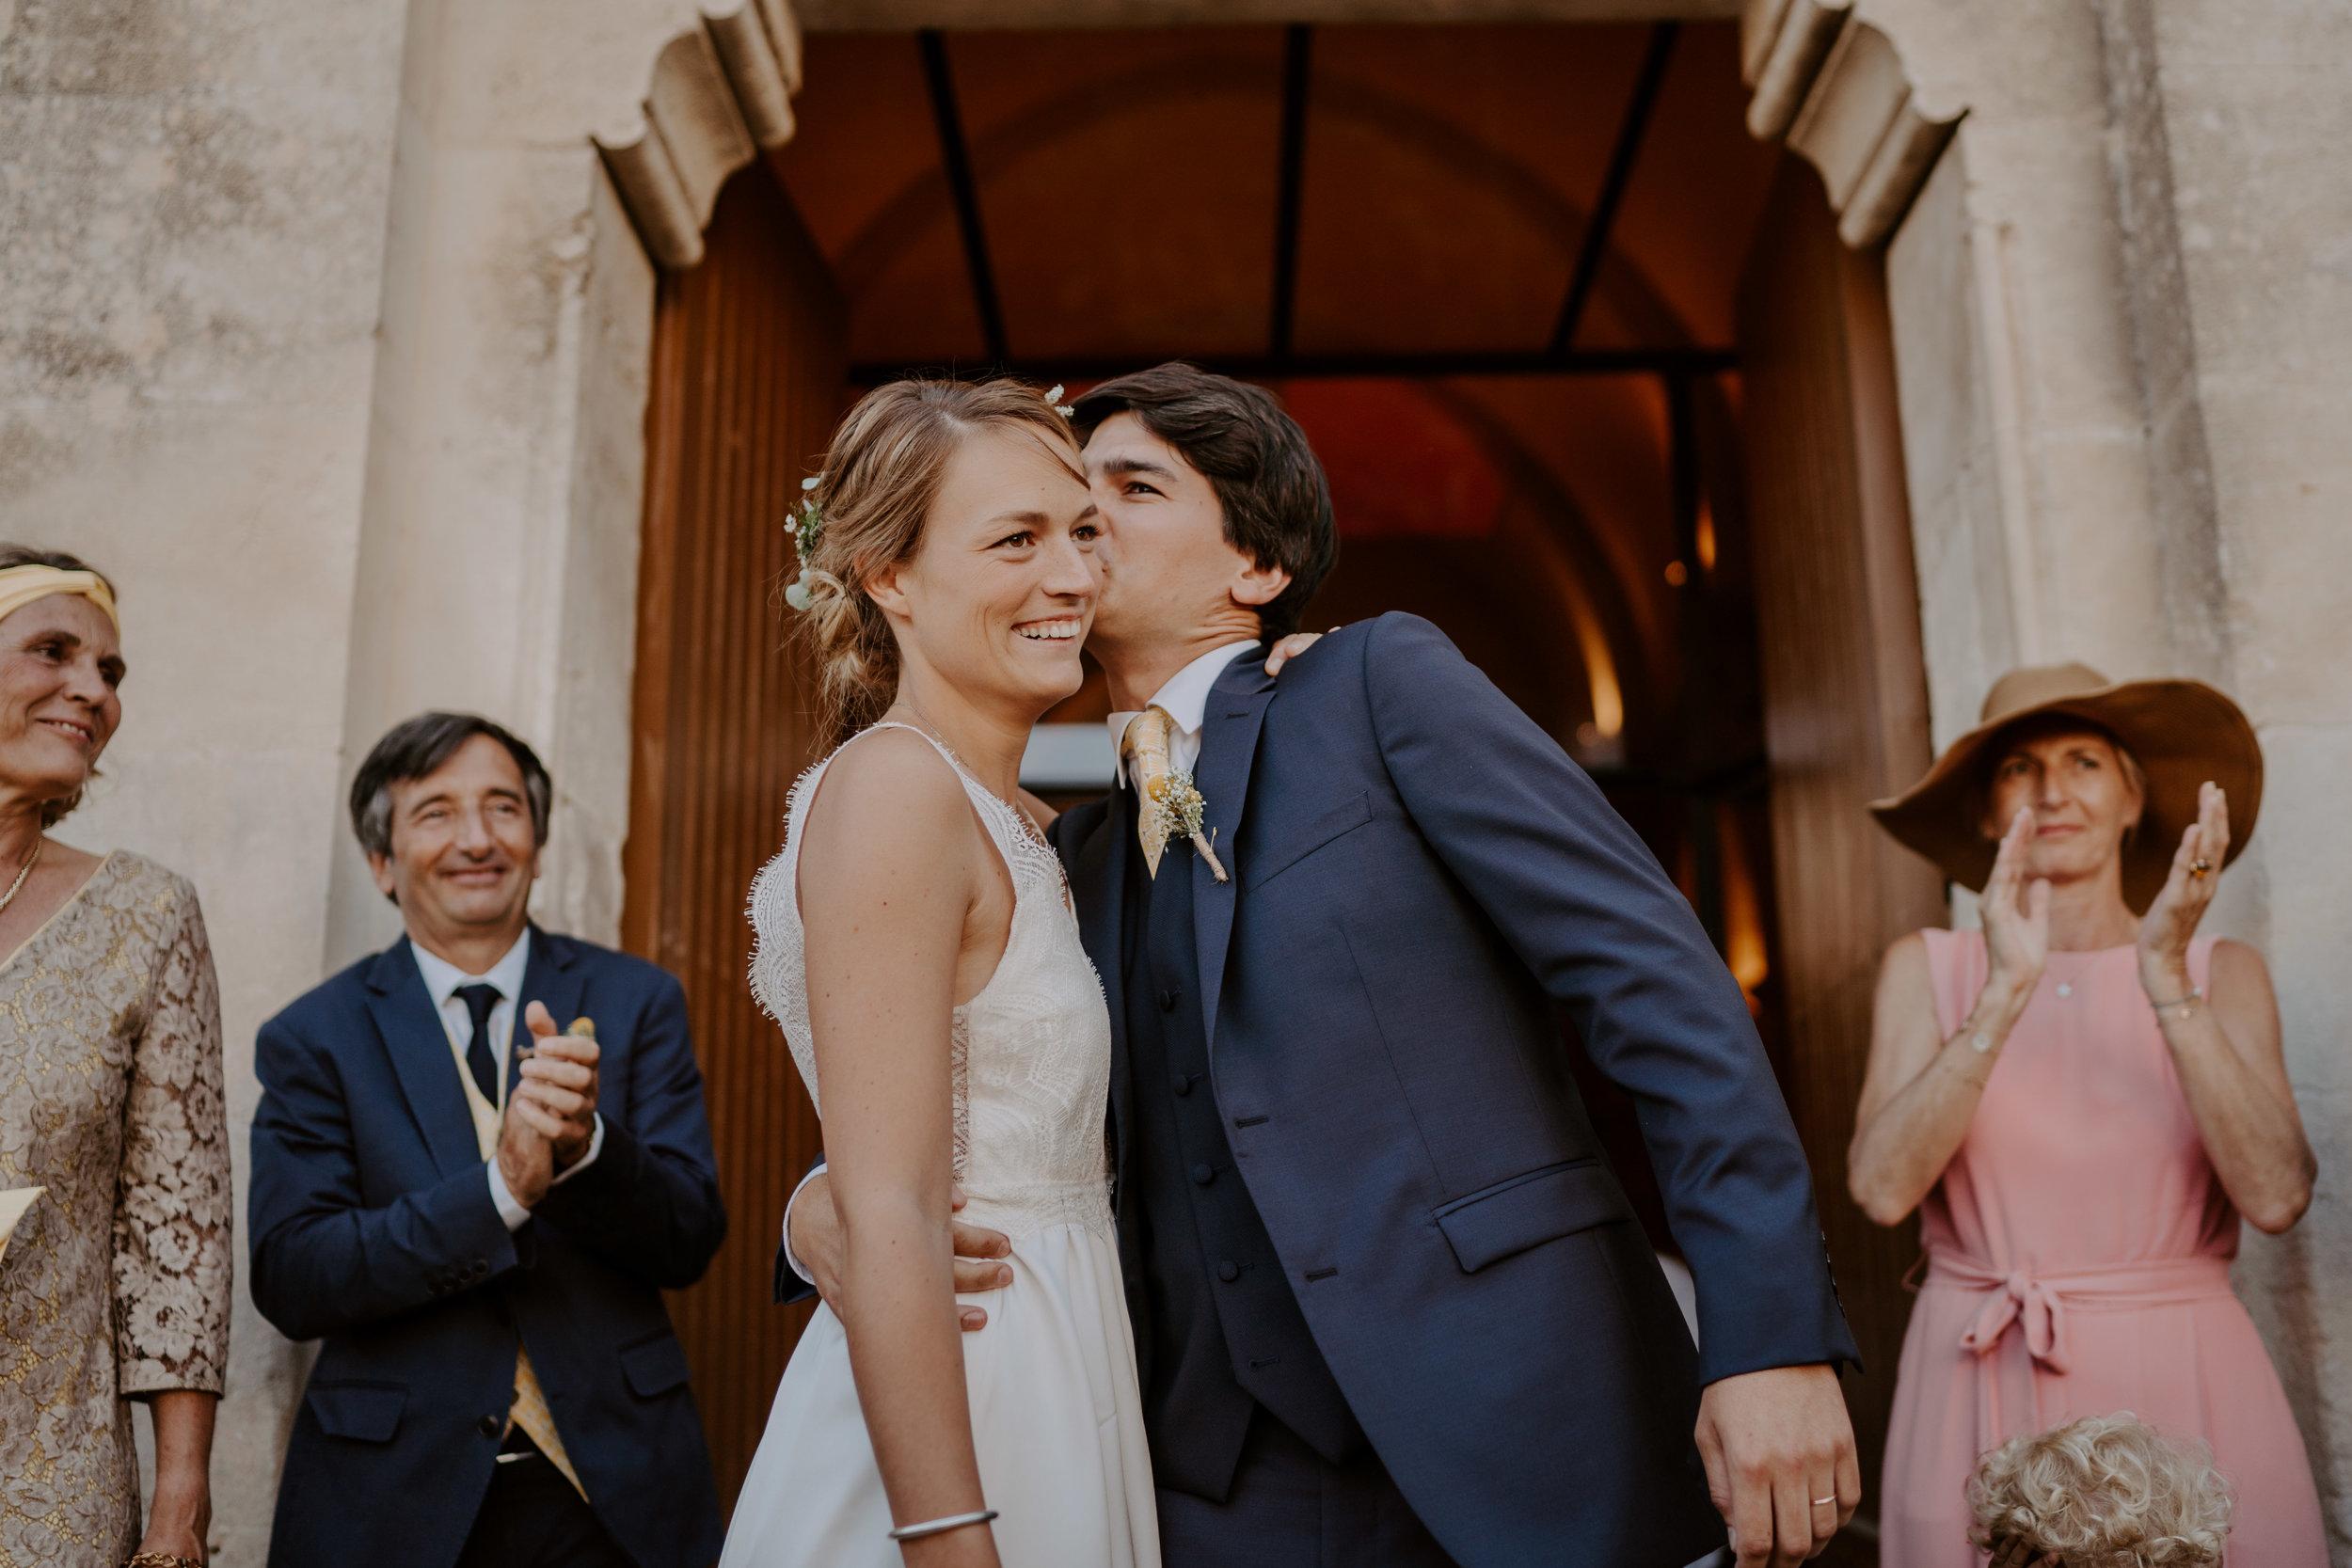 elsacaza_photographe_mariage_Juliette_Nicolas-358.jpg